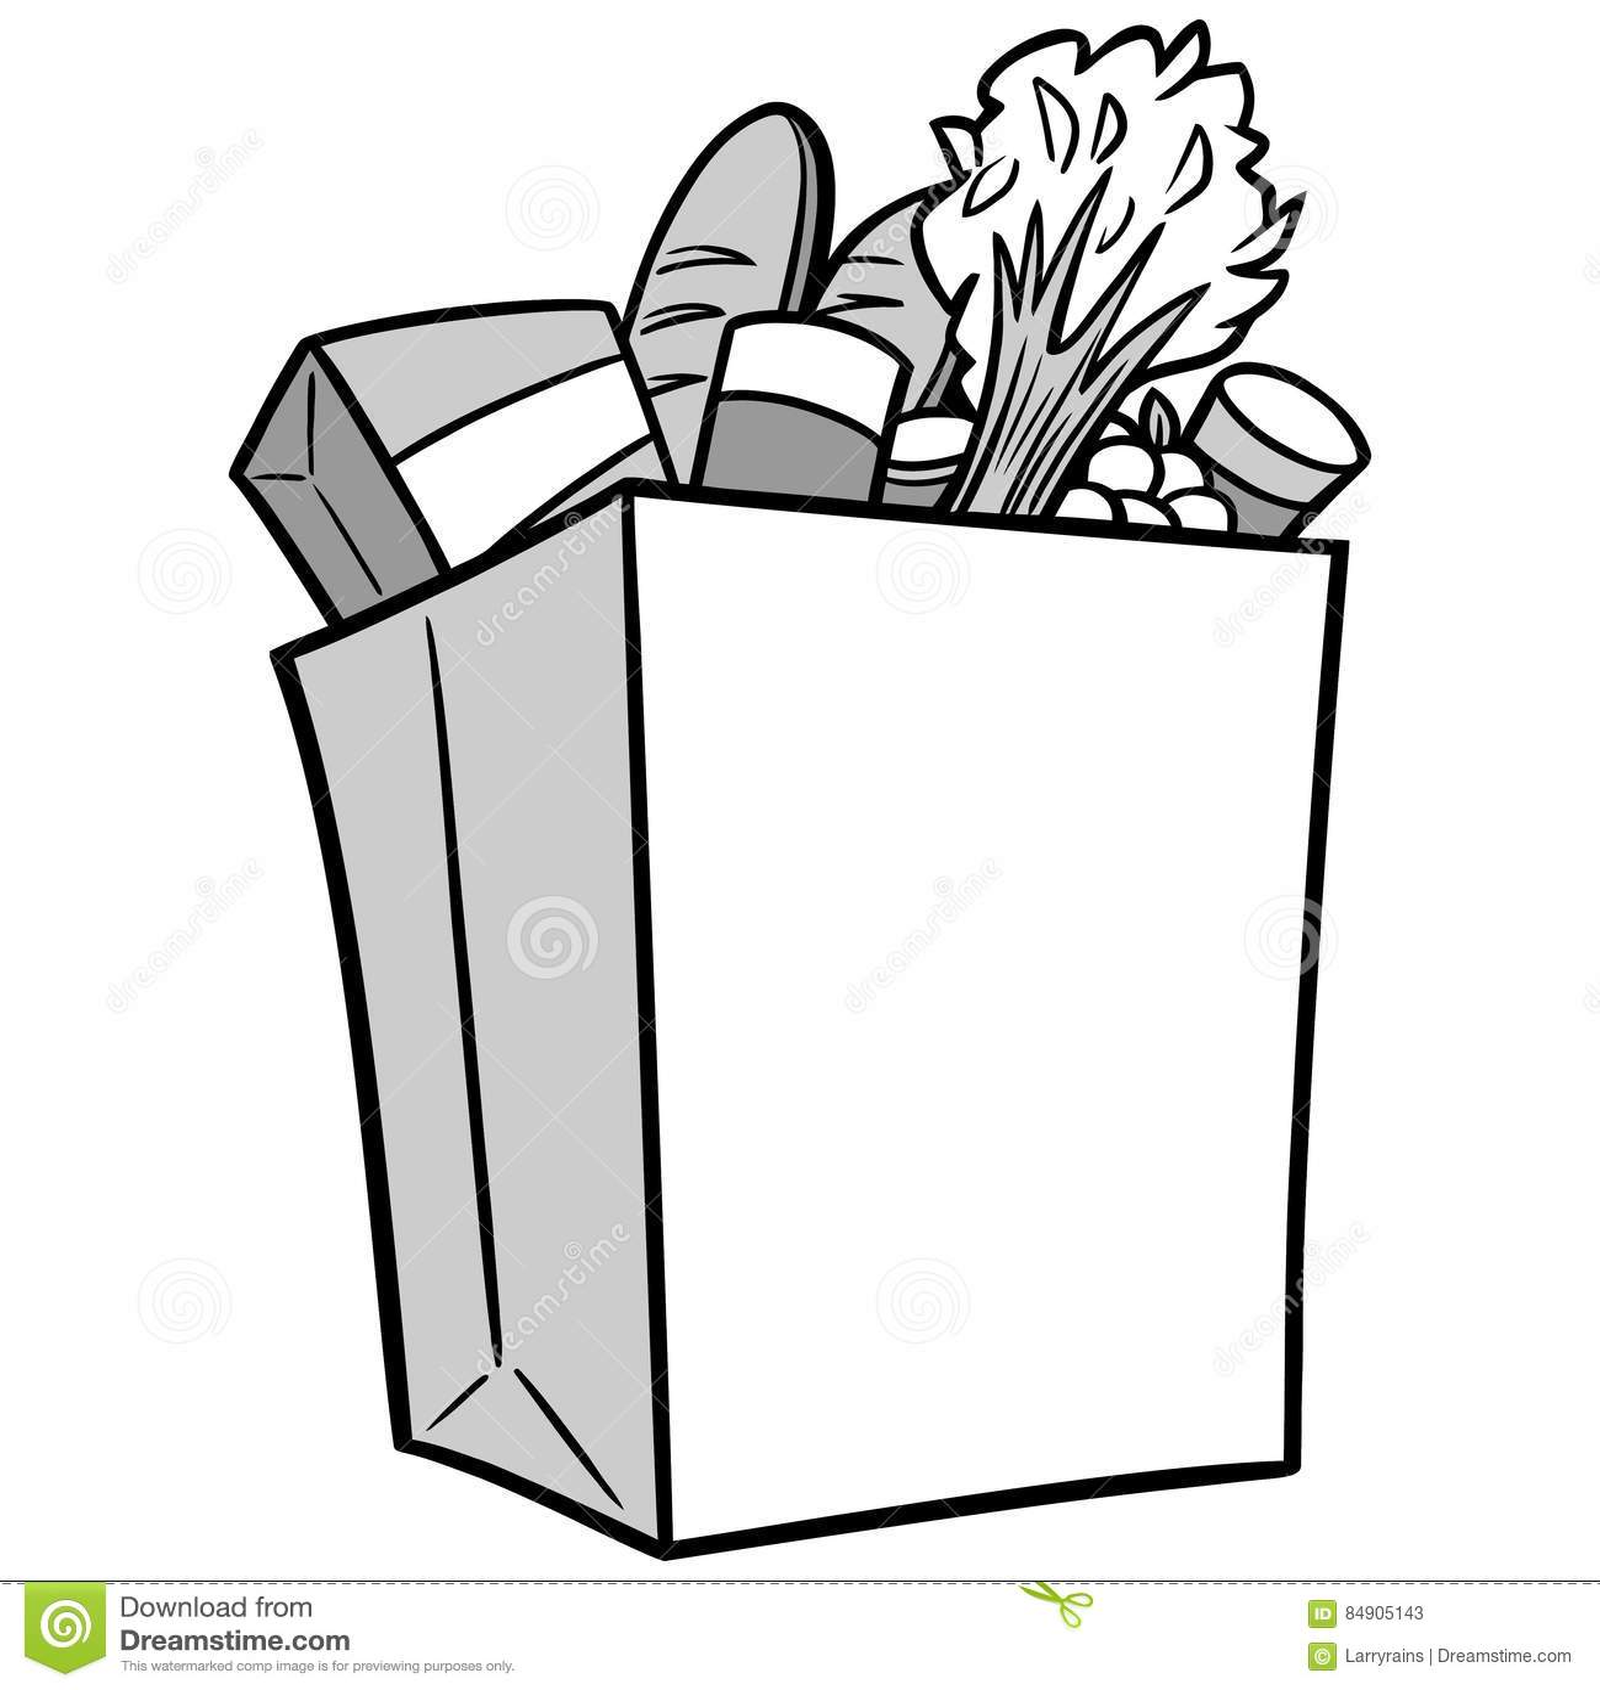 Grocery Bag Illustration Stock Vector Illustration Of